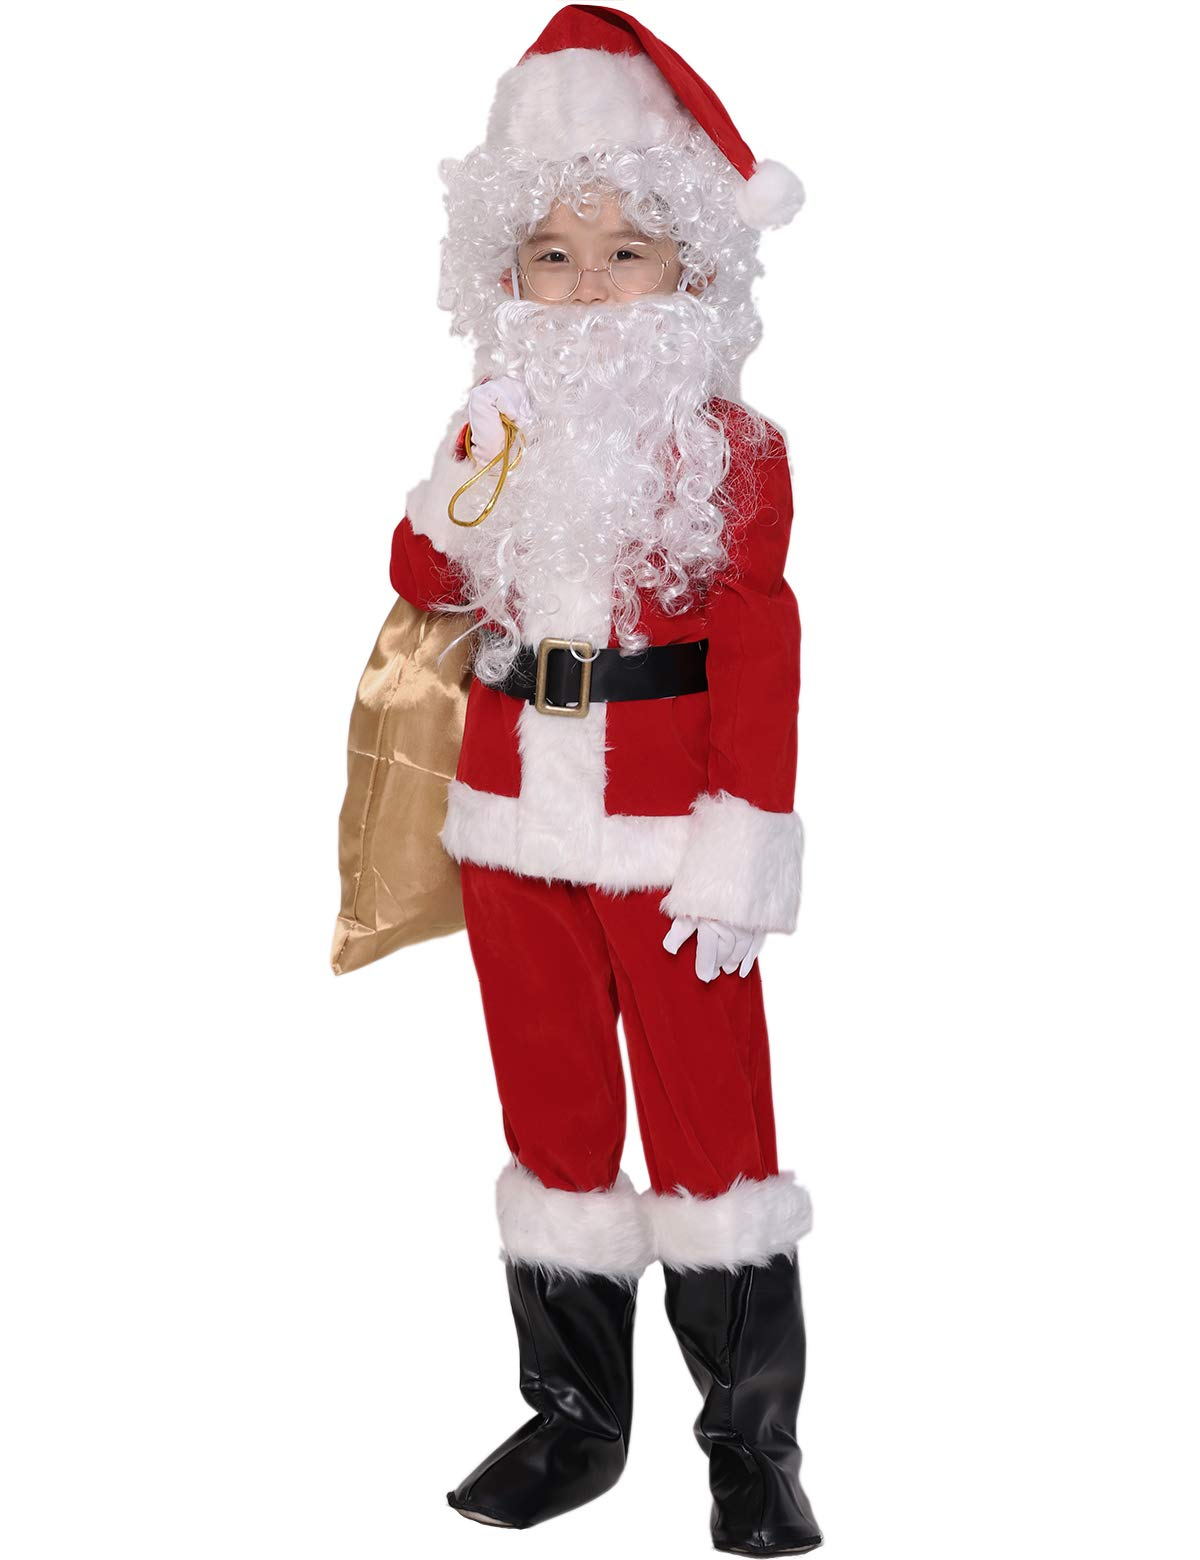 ADOMI Children's Deluxe Santa Suit 10pc. Christmas Child Santa Claus Kids Halloween Costume Cosplay M